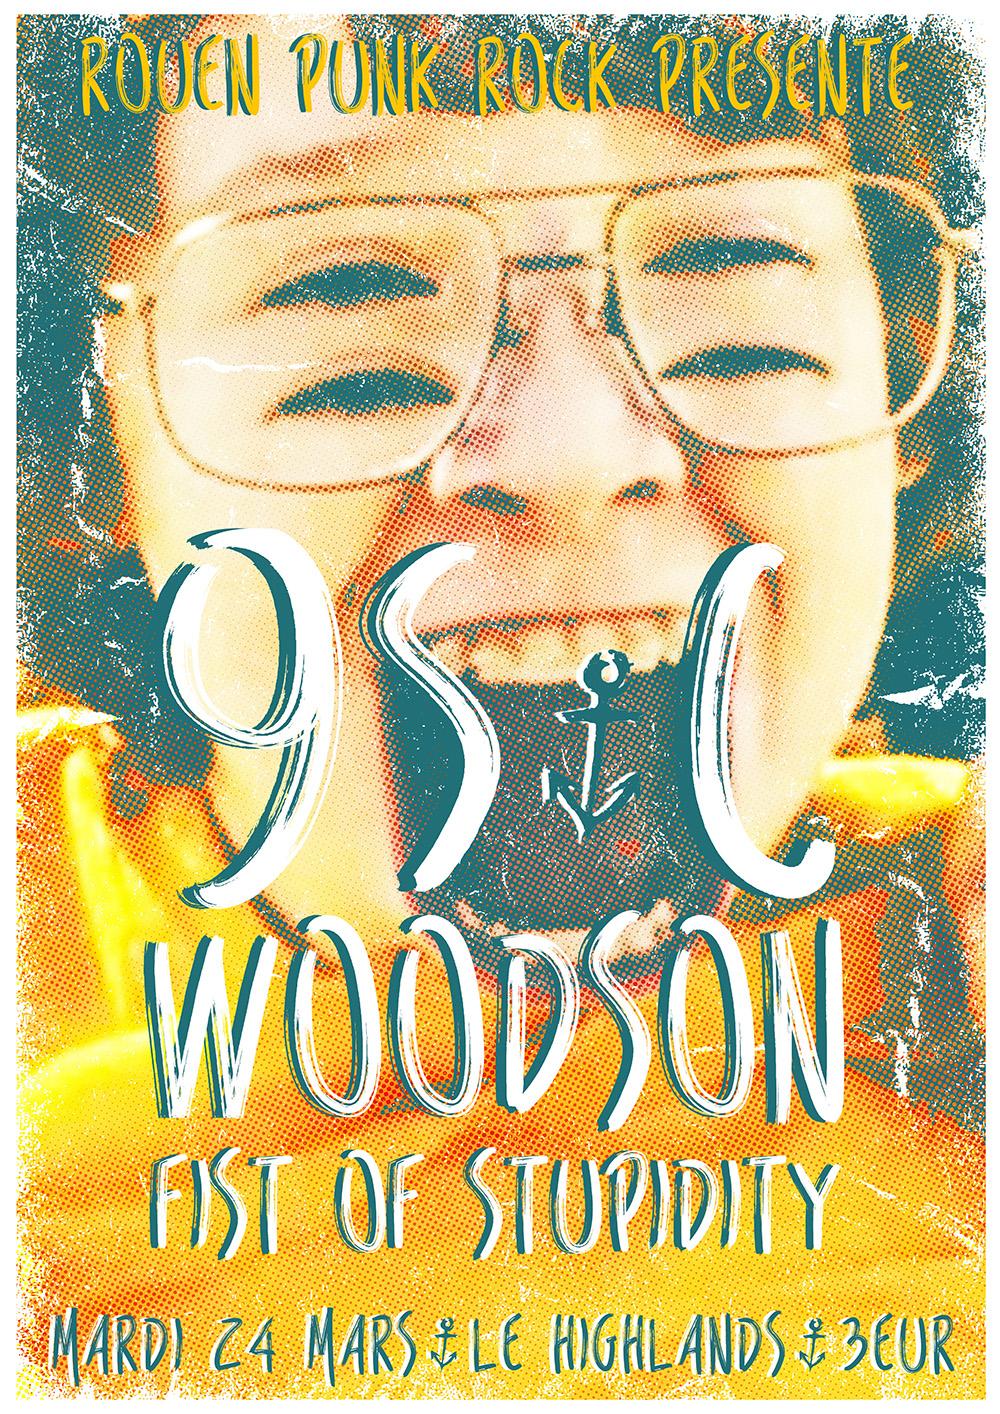 95C_Woodson_FOS_web